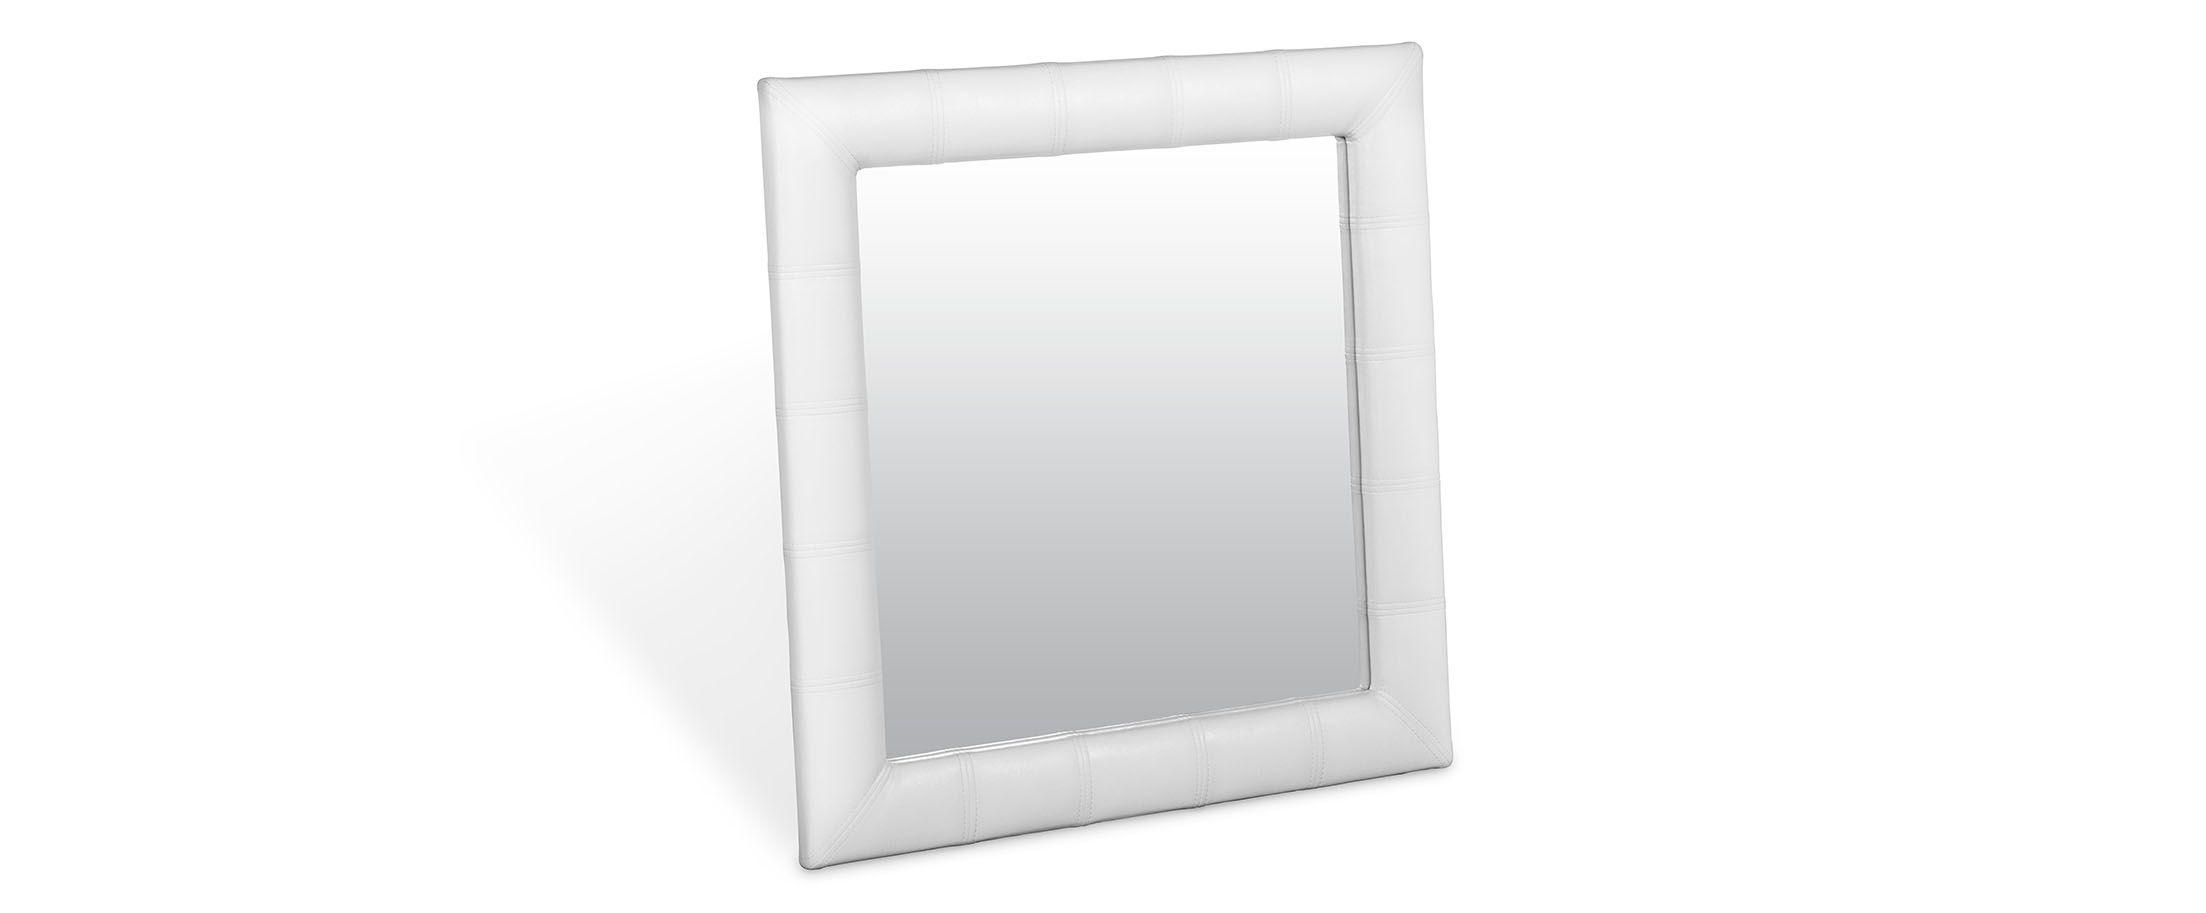 Зеркало Кааба квадратное марципанЗеркало навесное в спальню. Обивка из экокожи. Артикул: К000480<br>